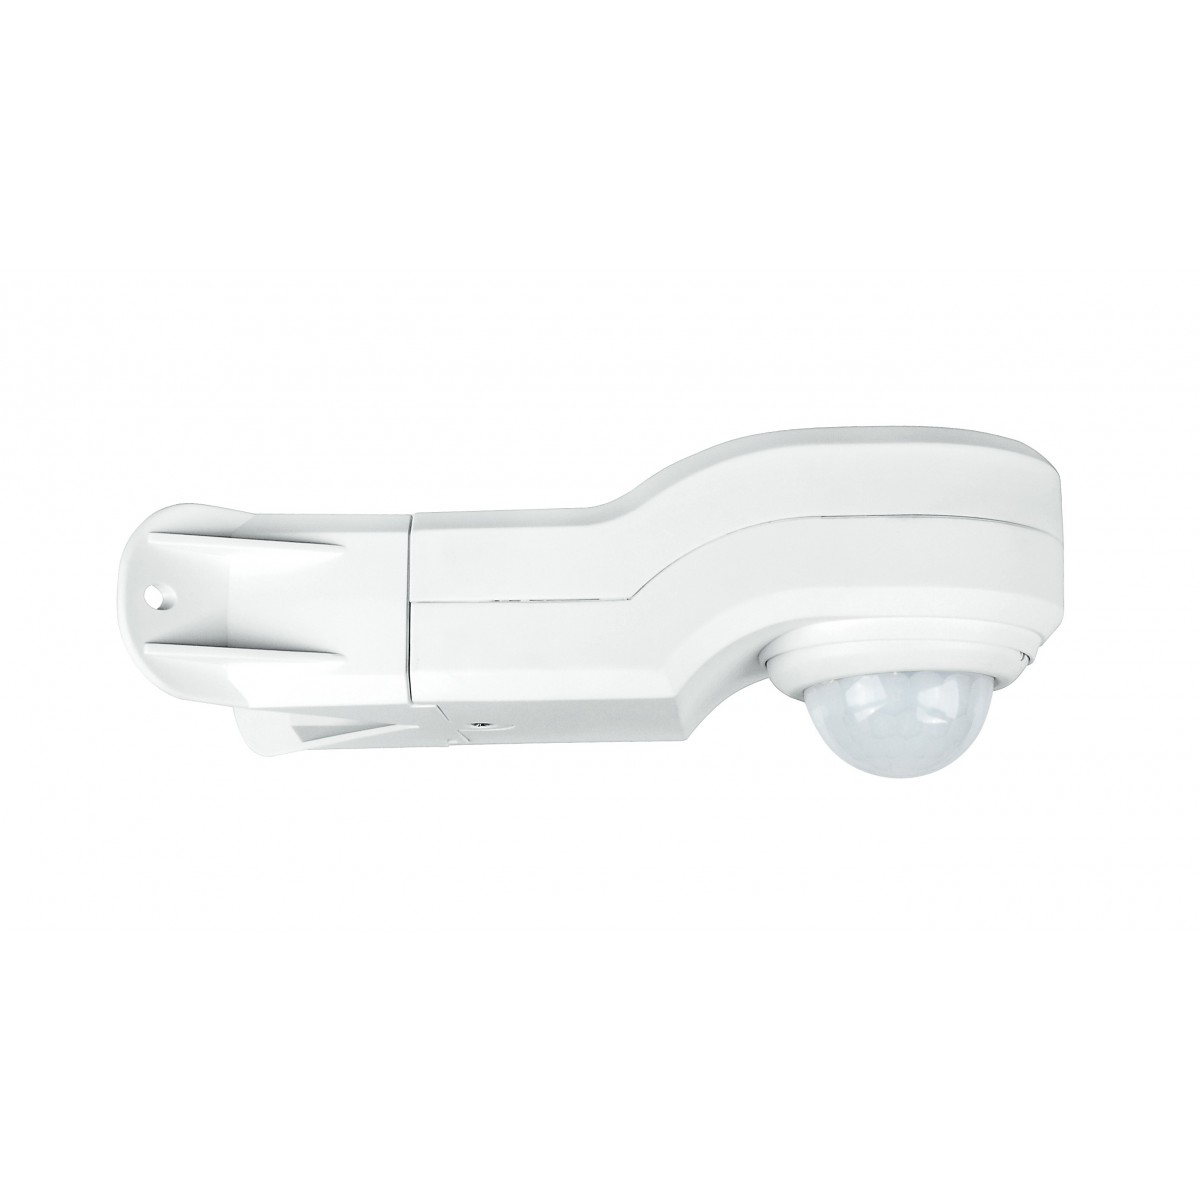 I-SENSOR-130 - Capteur de mouvement blanc 130 ° 1000 watts